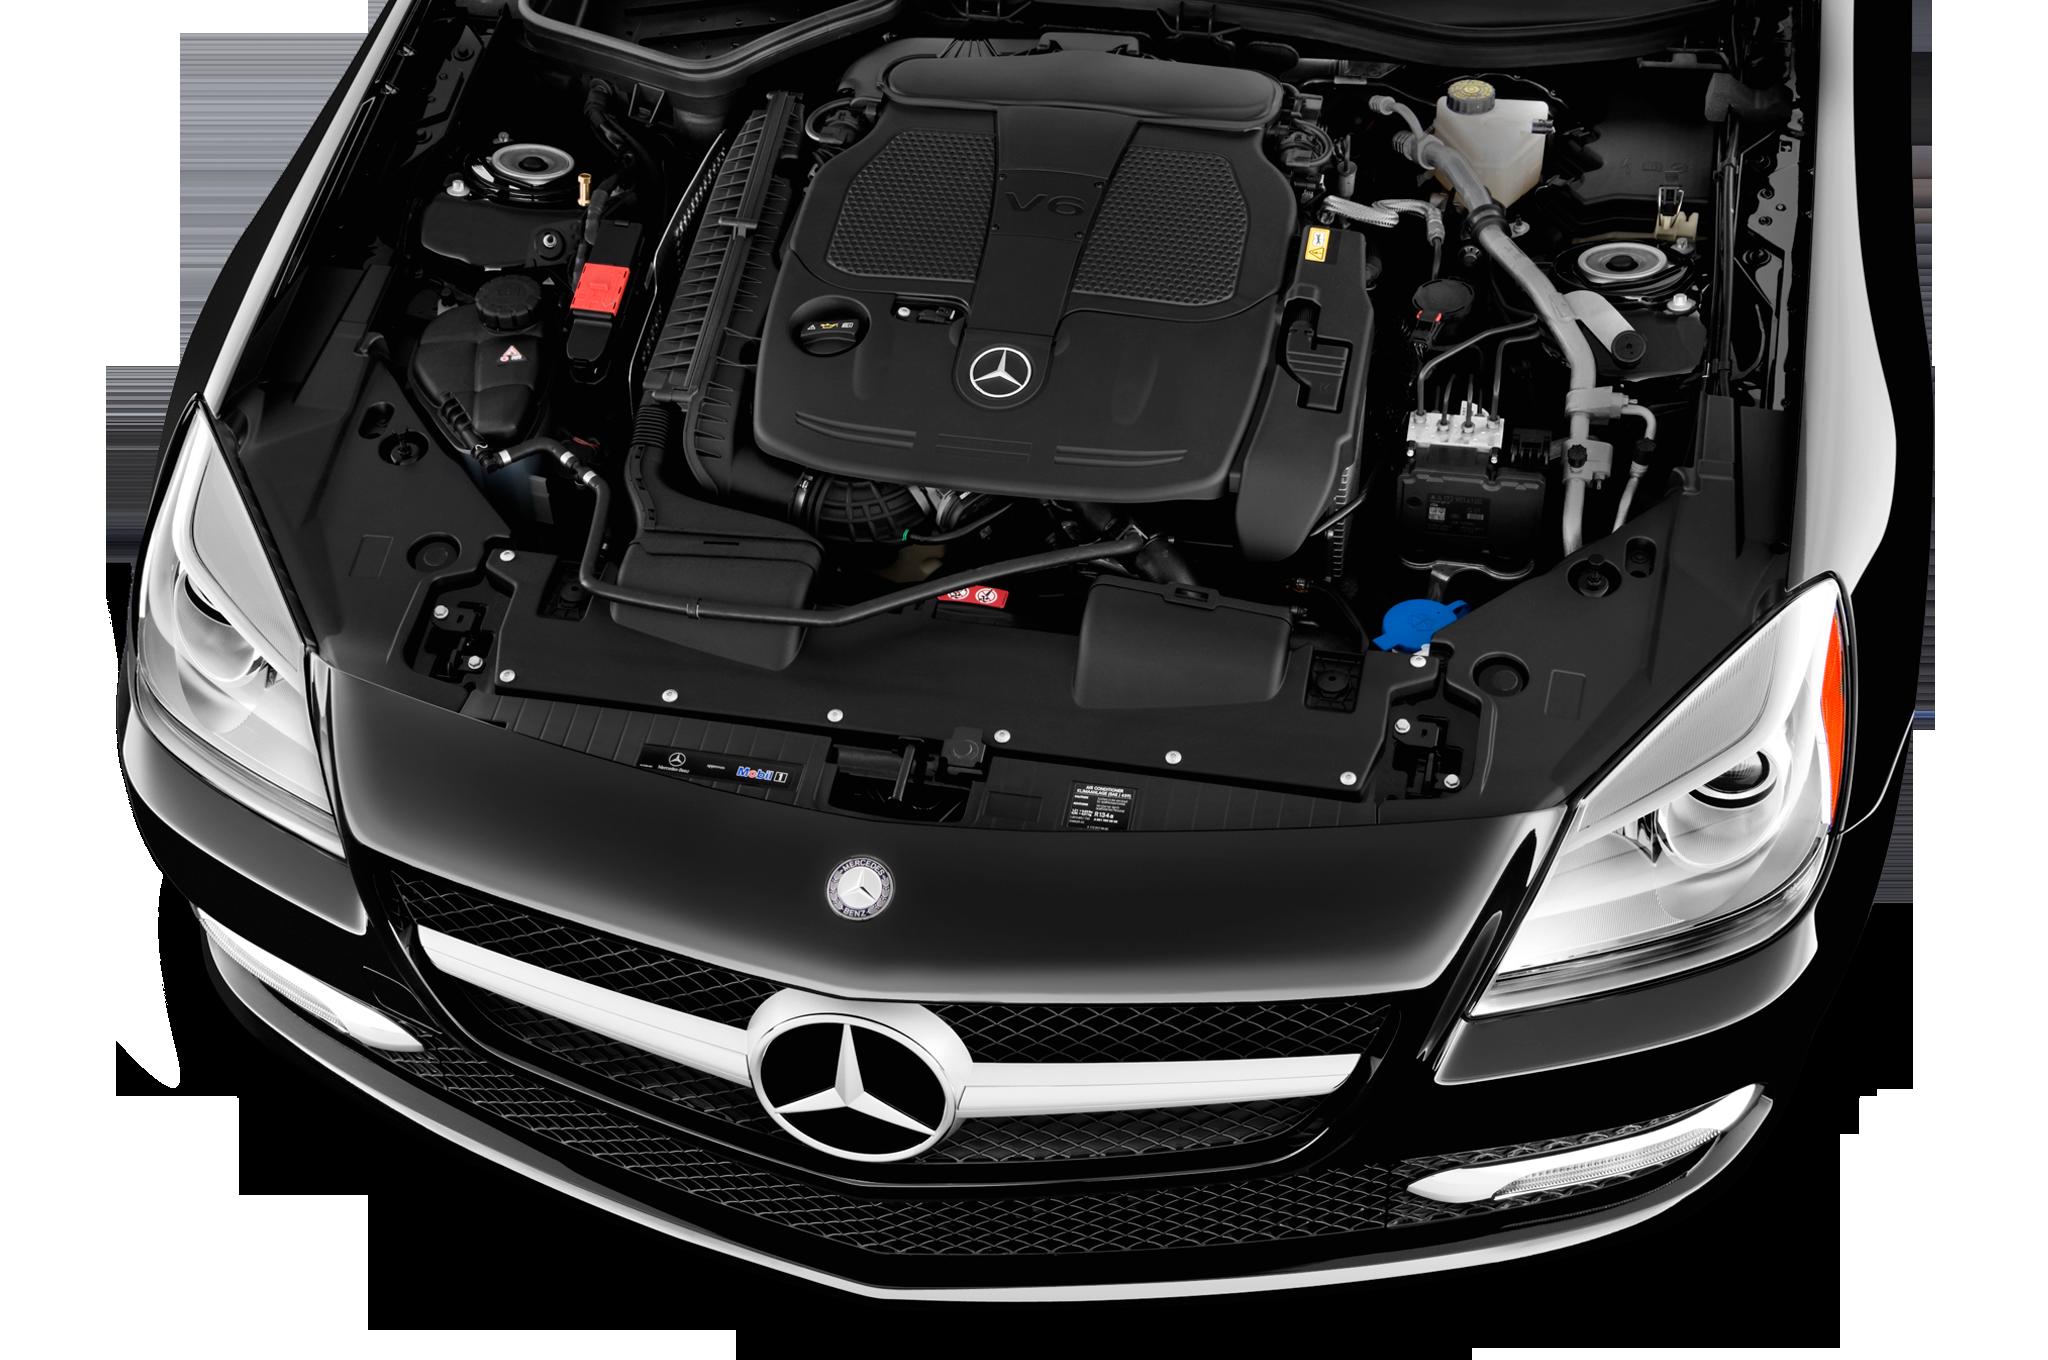 2012 Mercedes Benz Slk250 Editors Notebook Automobile Magazine October Fuse Box Diagram 14 25